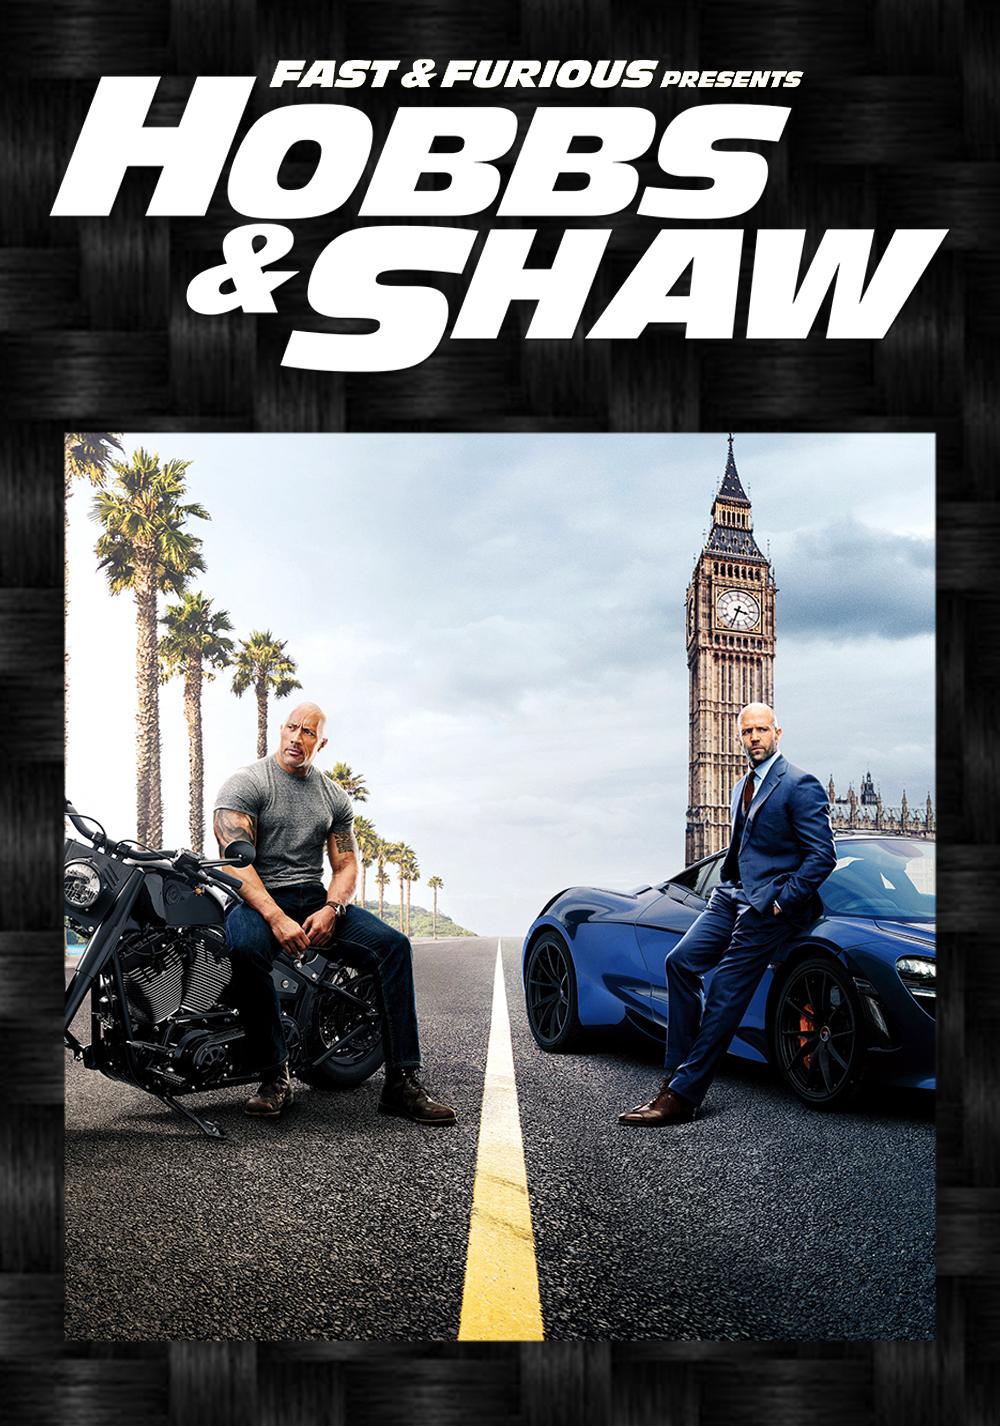 Fast Furious Presents Hobbs Shaw Movie Fanart Fanarttv